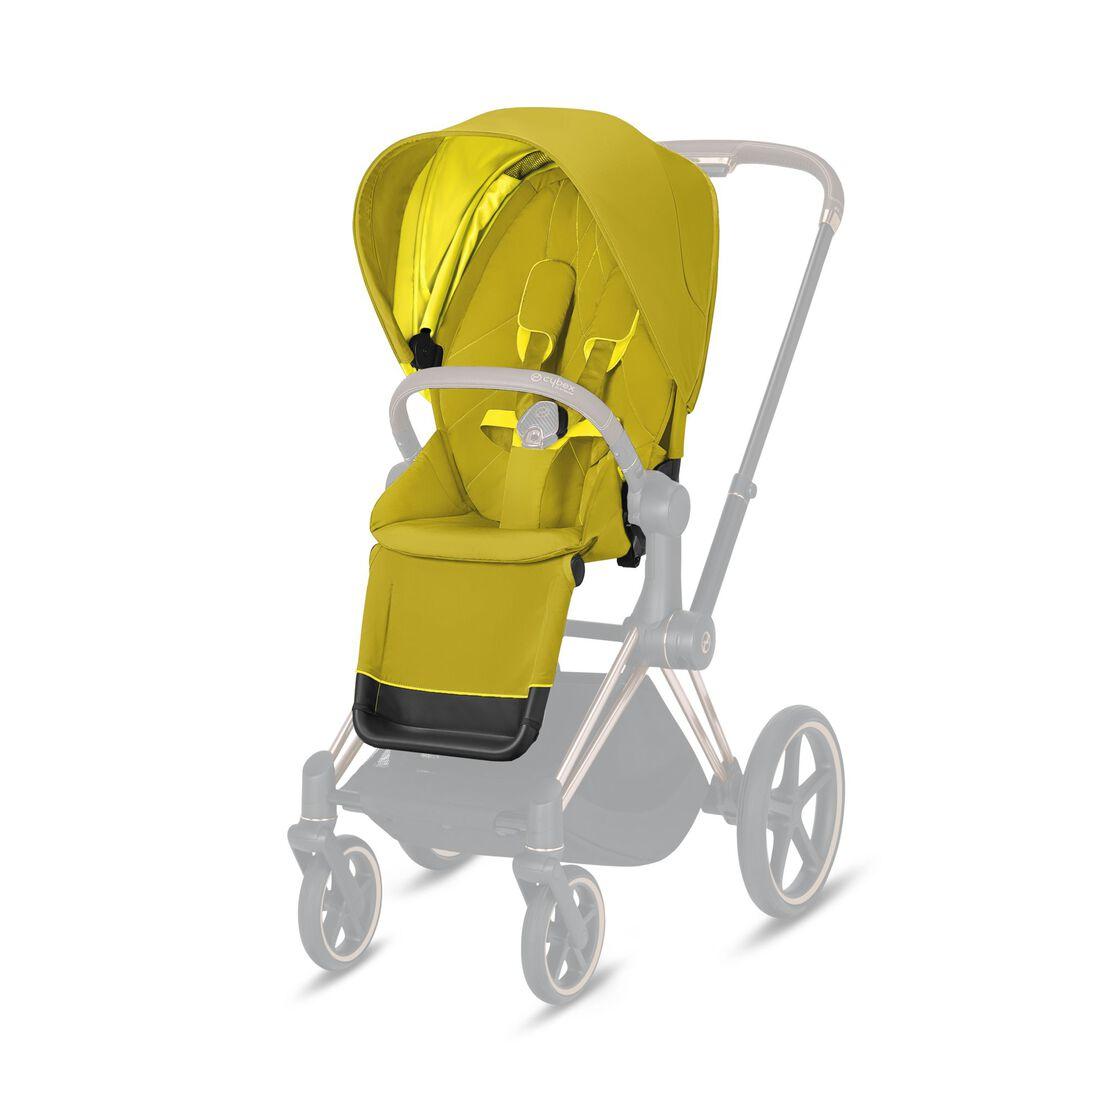 CYBEX Priam Sitzpaket - Mustard Yellow in Mustard Yellow large Bild 1